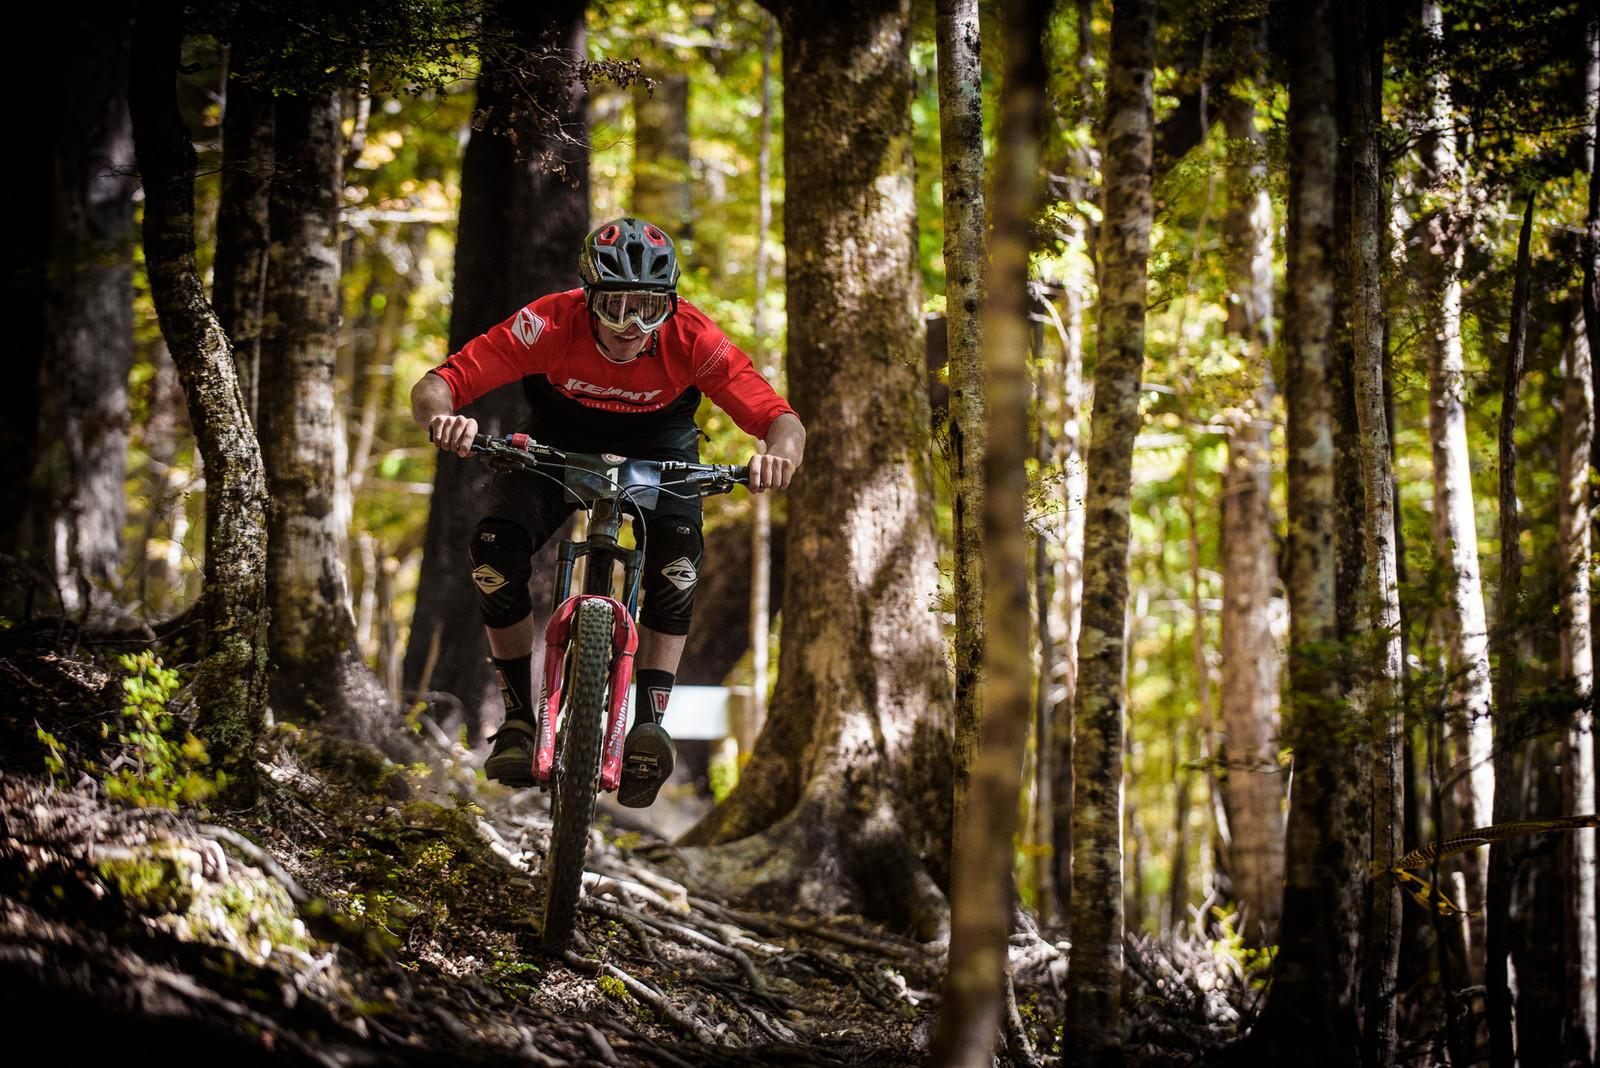 2019 Dodzy Memorial Enduro Race Recap and Photos - 2019 Dodzy Memorial Enduro - Mountain Biking Pictures - Vital MTB